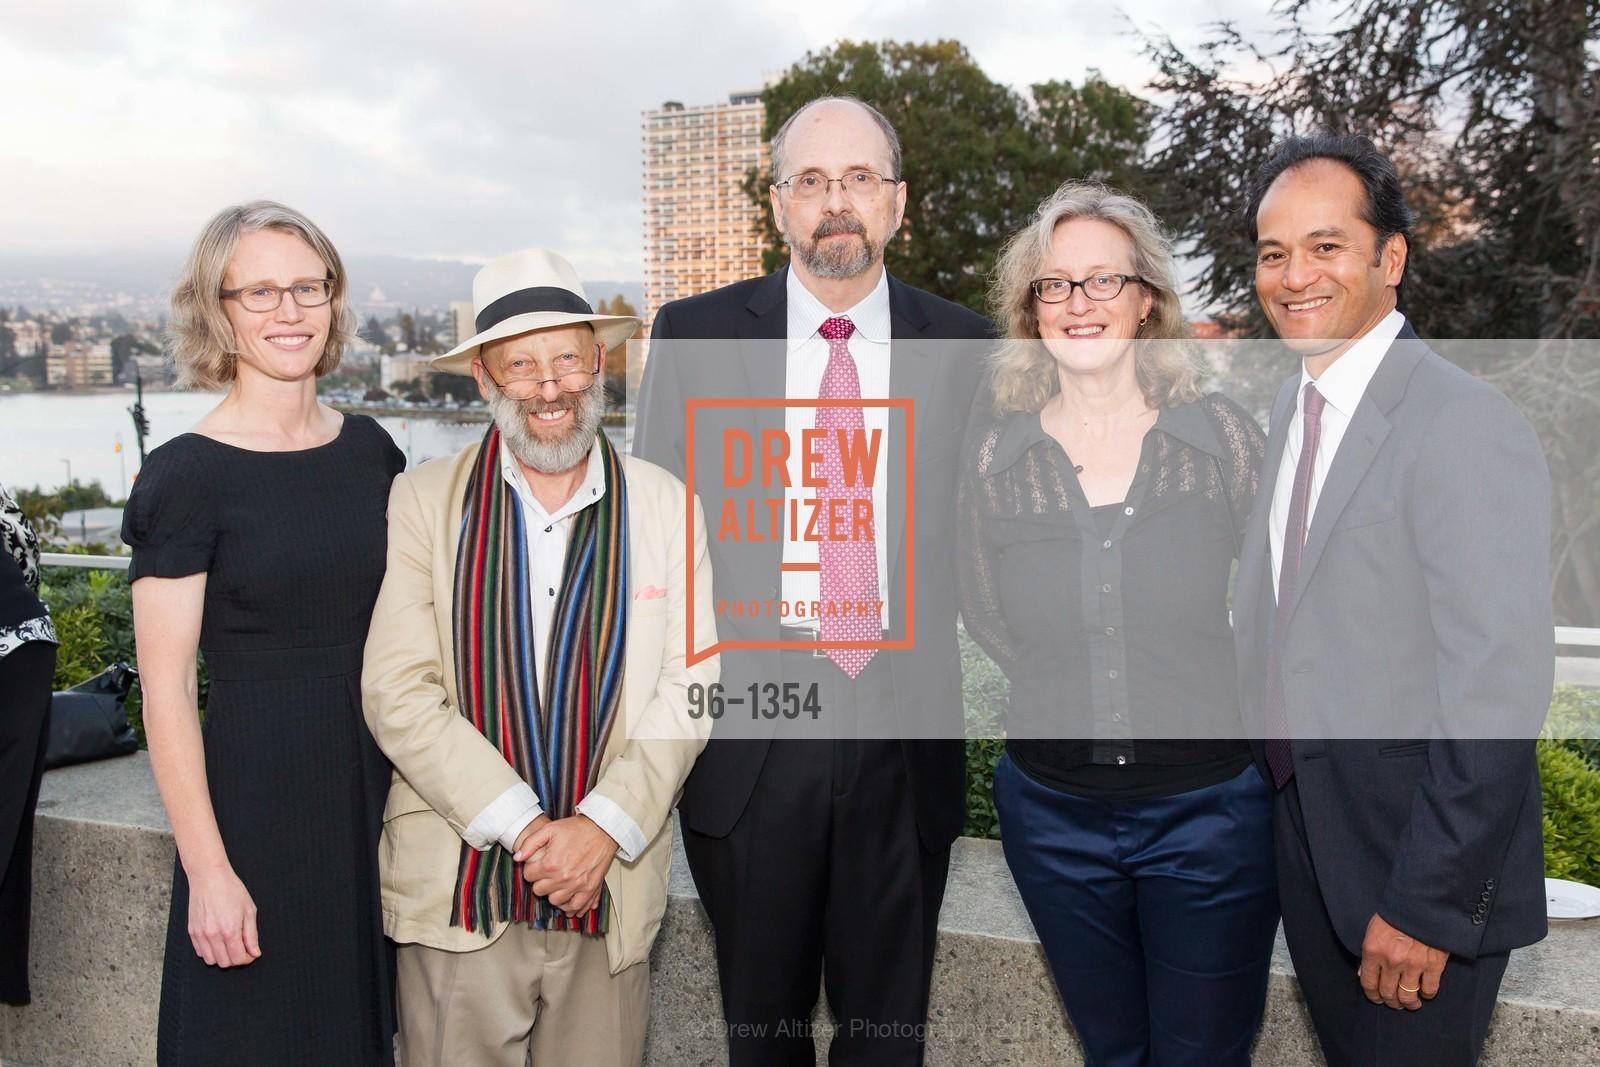 Caitlin Haskell, Peter Samis, Drew Johnson, Janet Bishop, Rene Deguzman, Photo #96-1354